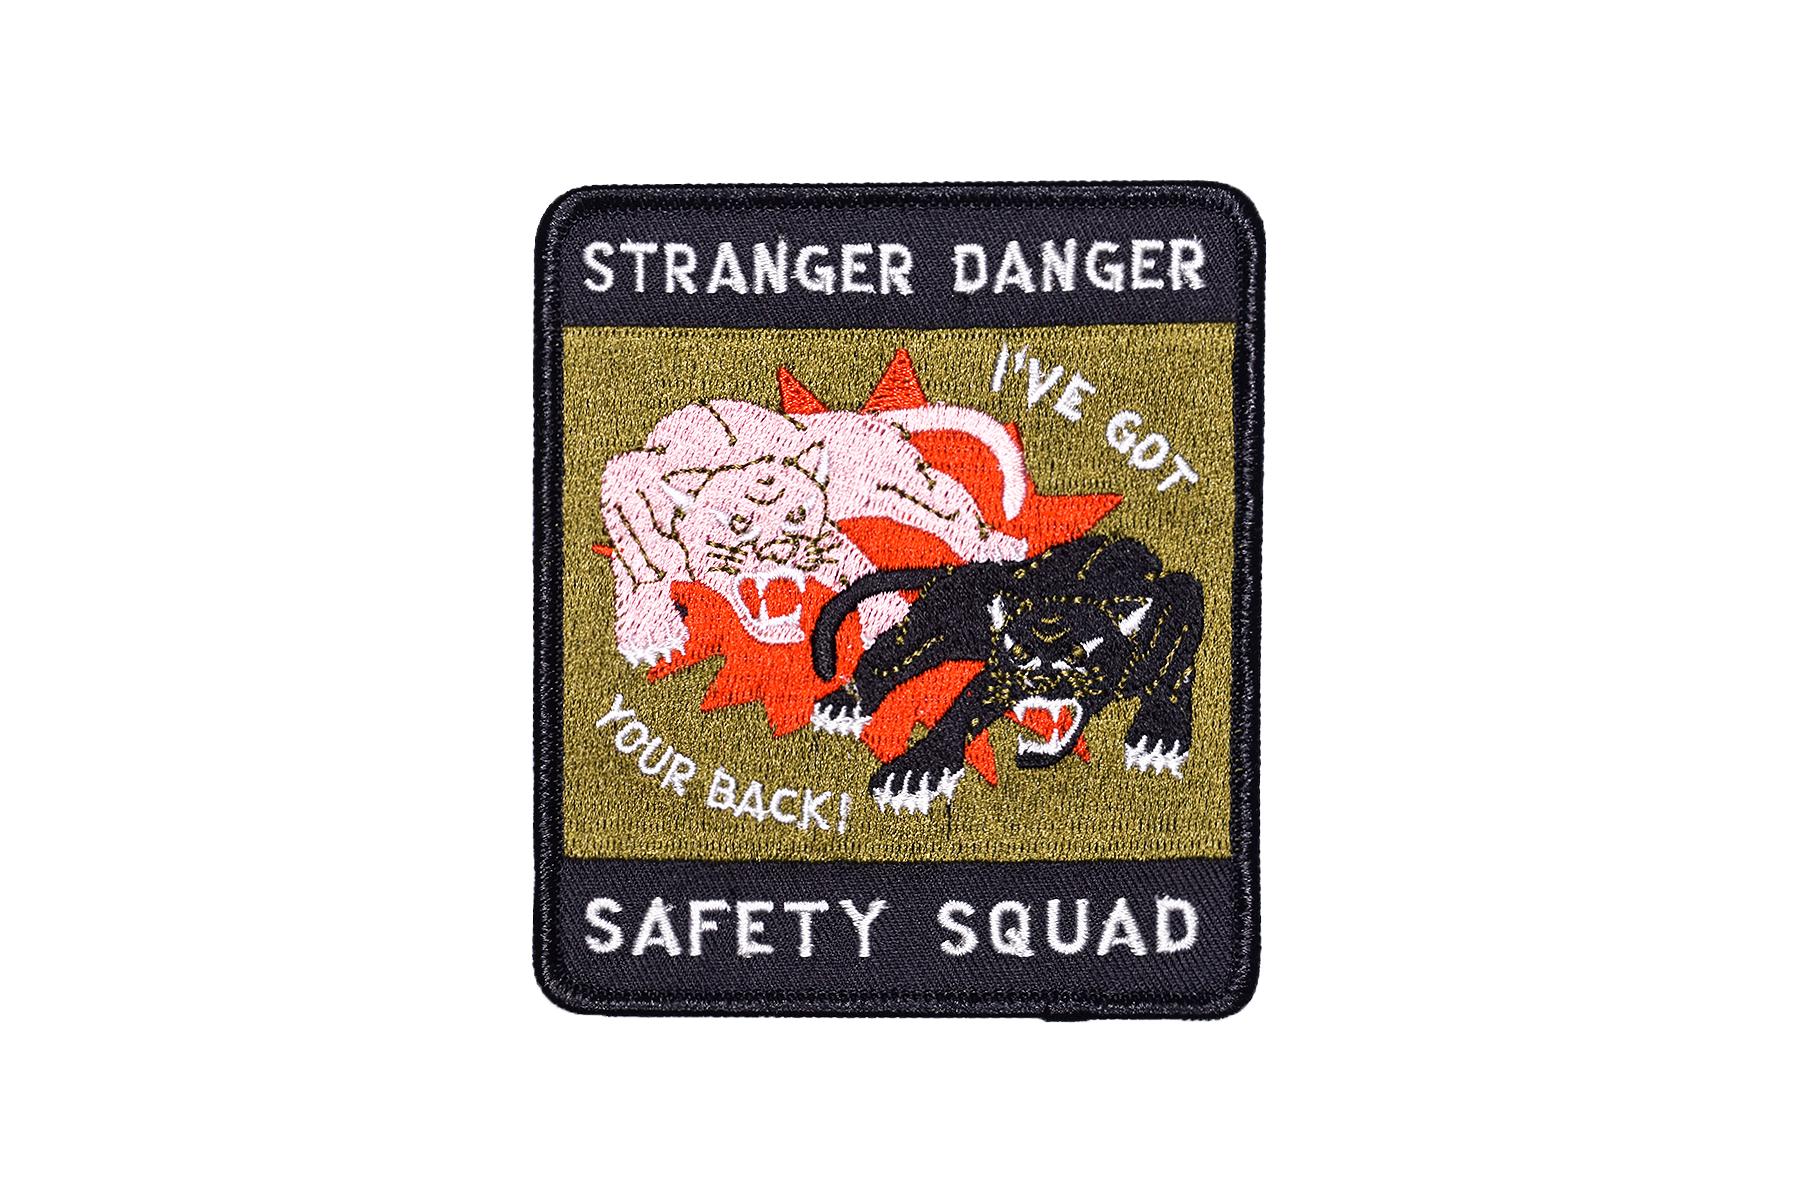 STRANGER DANGER SAFETY SQUAD Embroidered Patch